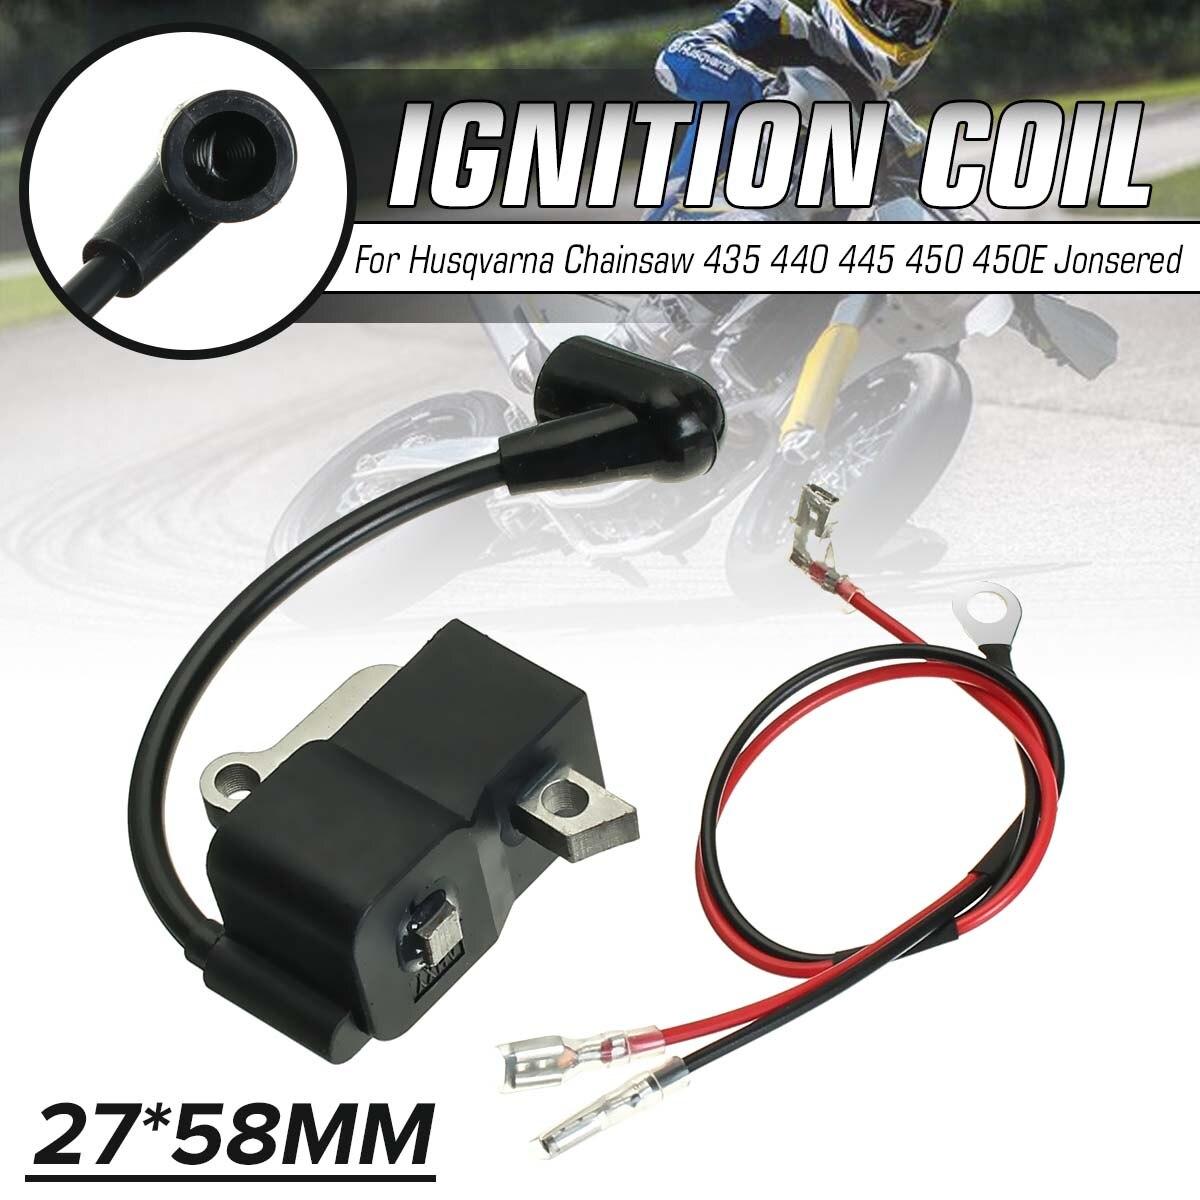 Ignition Coil สำหรับ Husqvarna Chainsaw 435 440 445 450 450E Jonsered